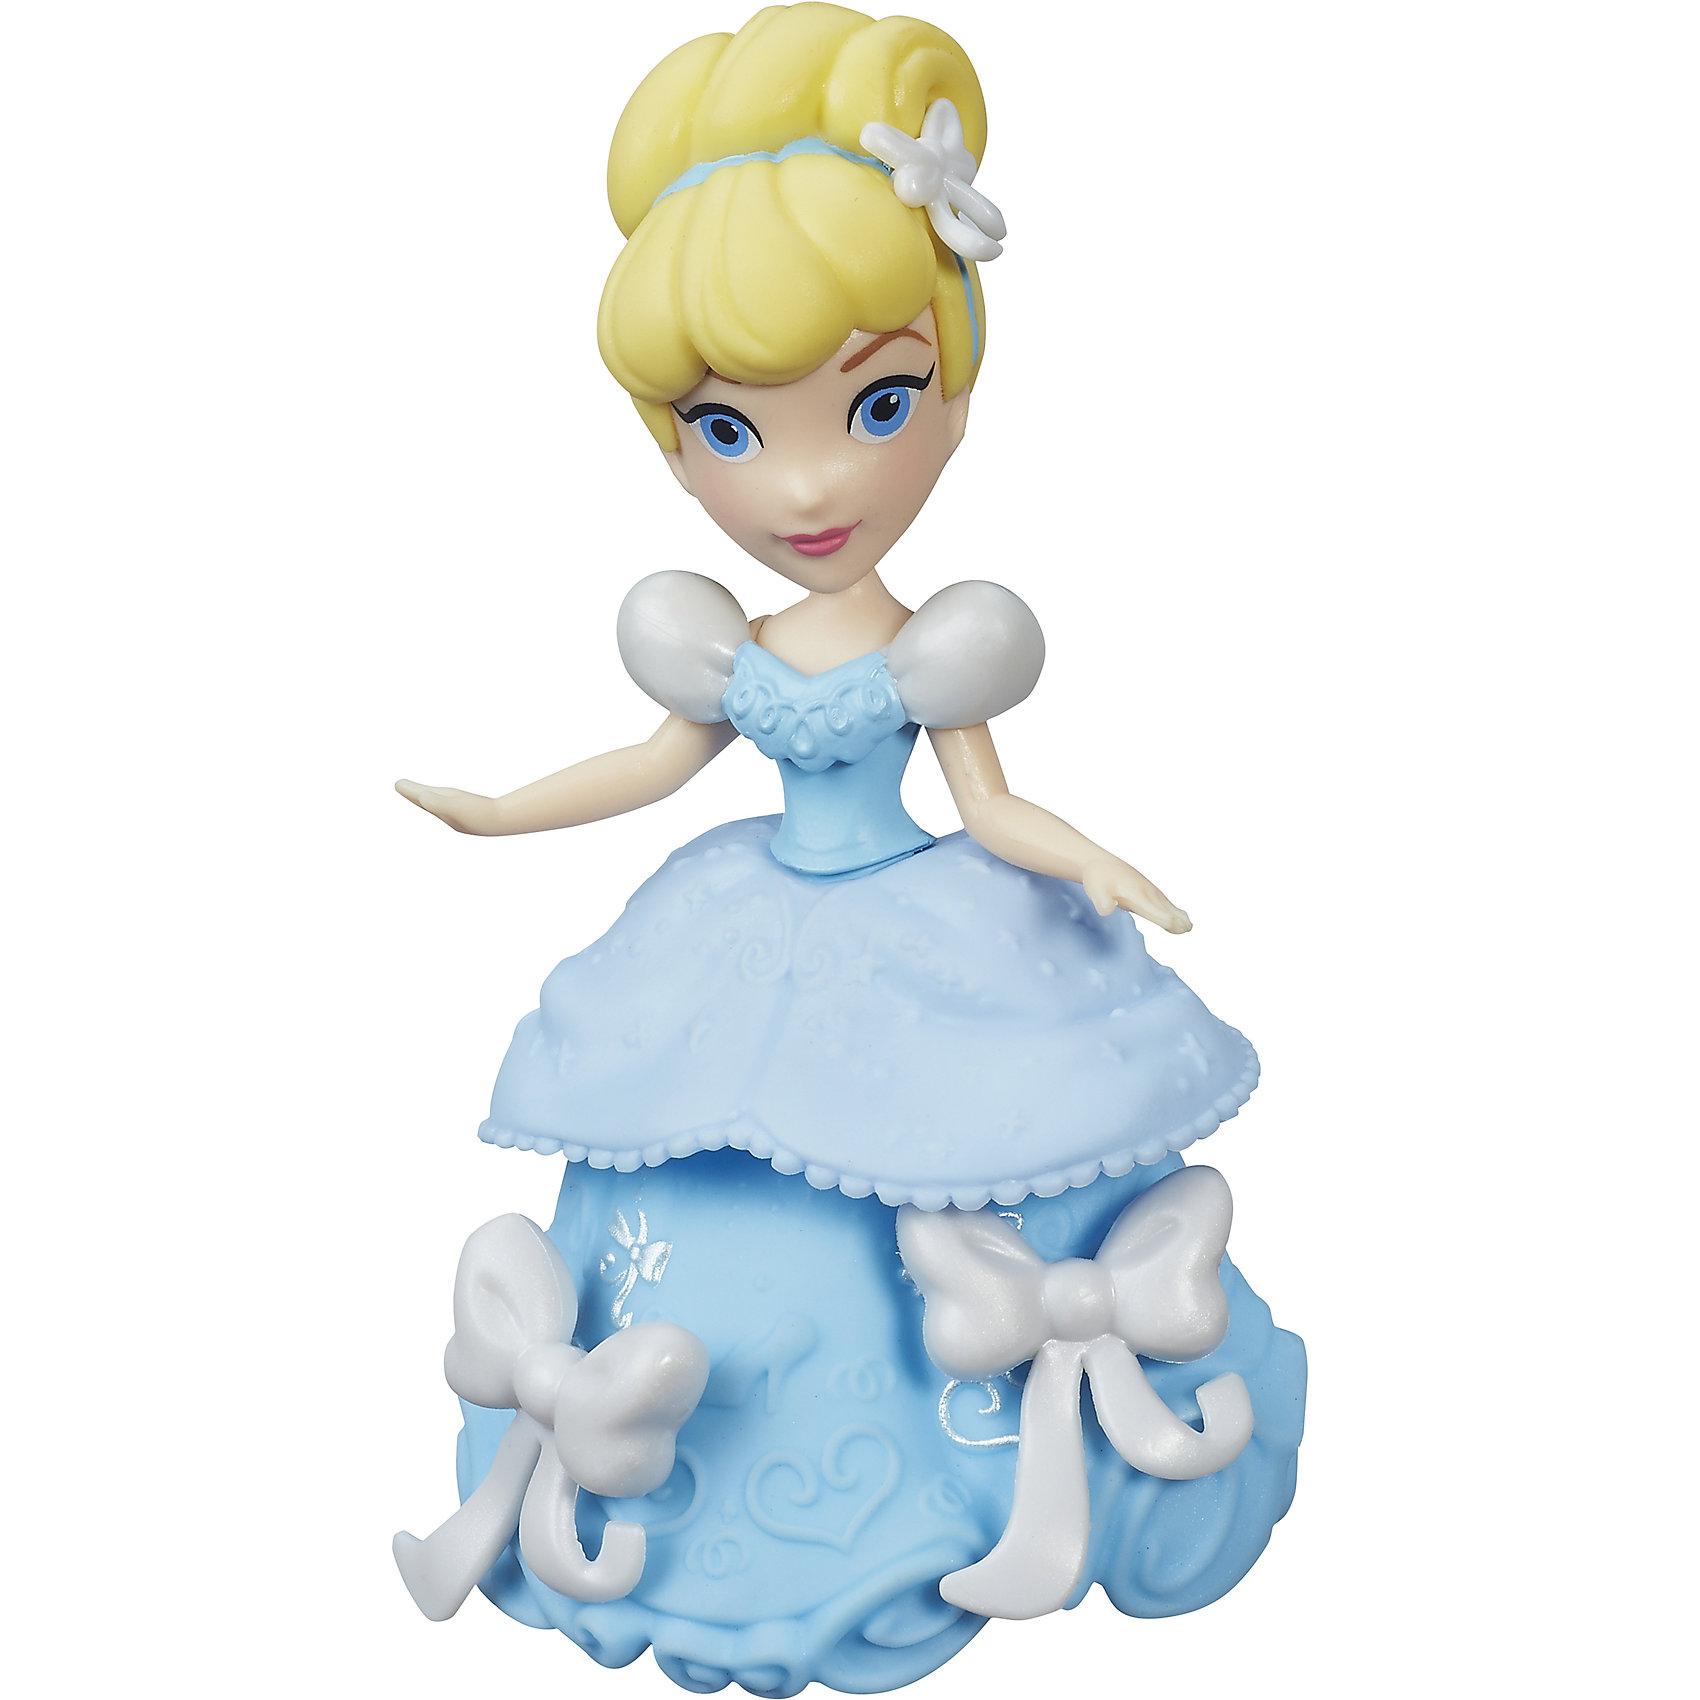 Hasbro Мини-кукла, Принцессы Дисней hasbro кукла рапунцель принцессы дисней